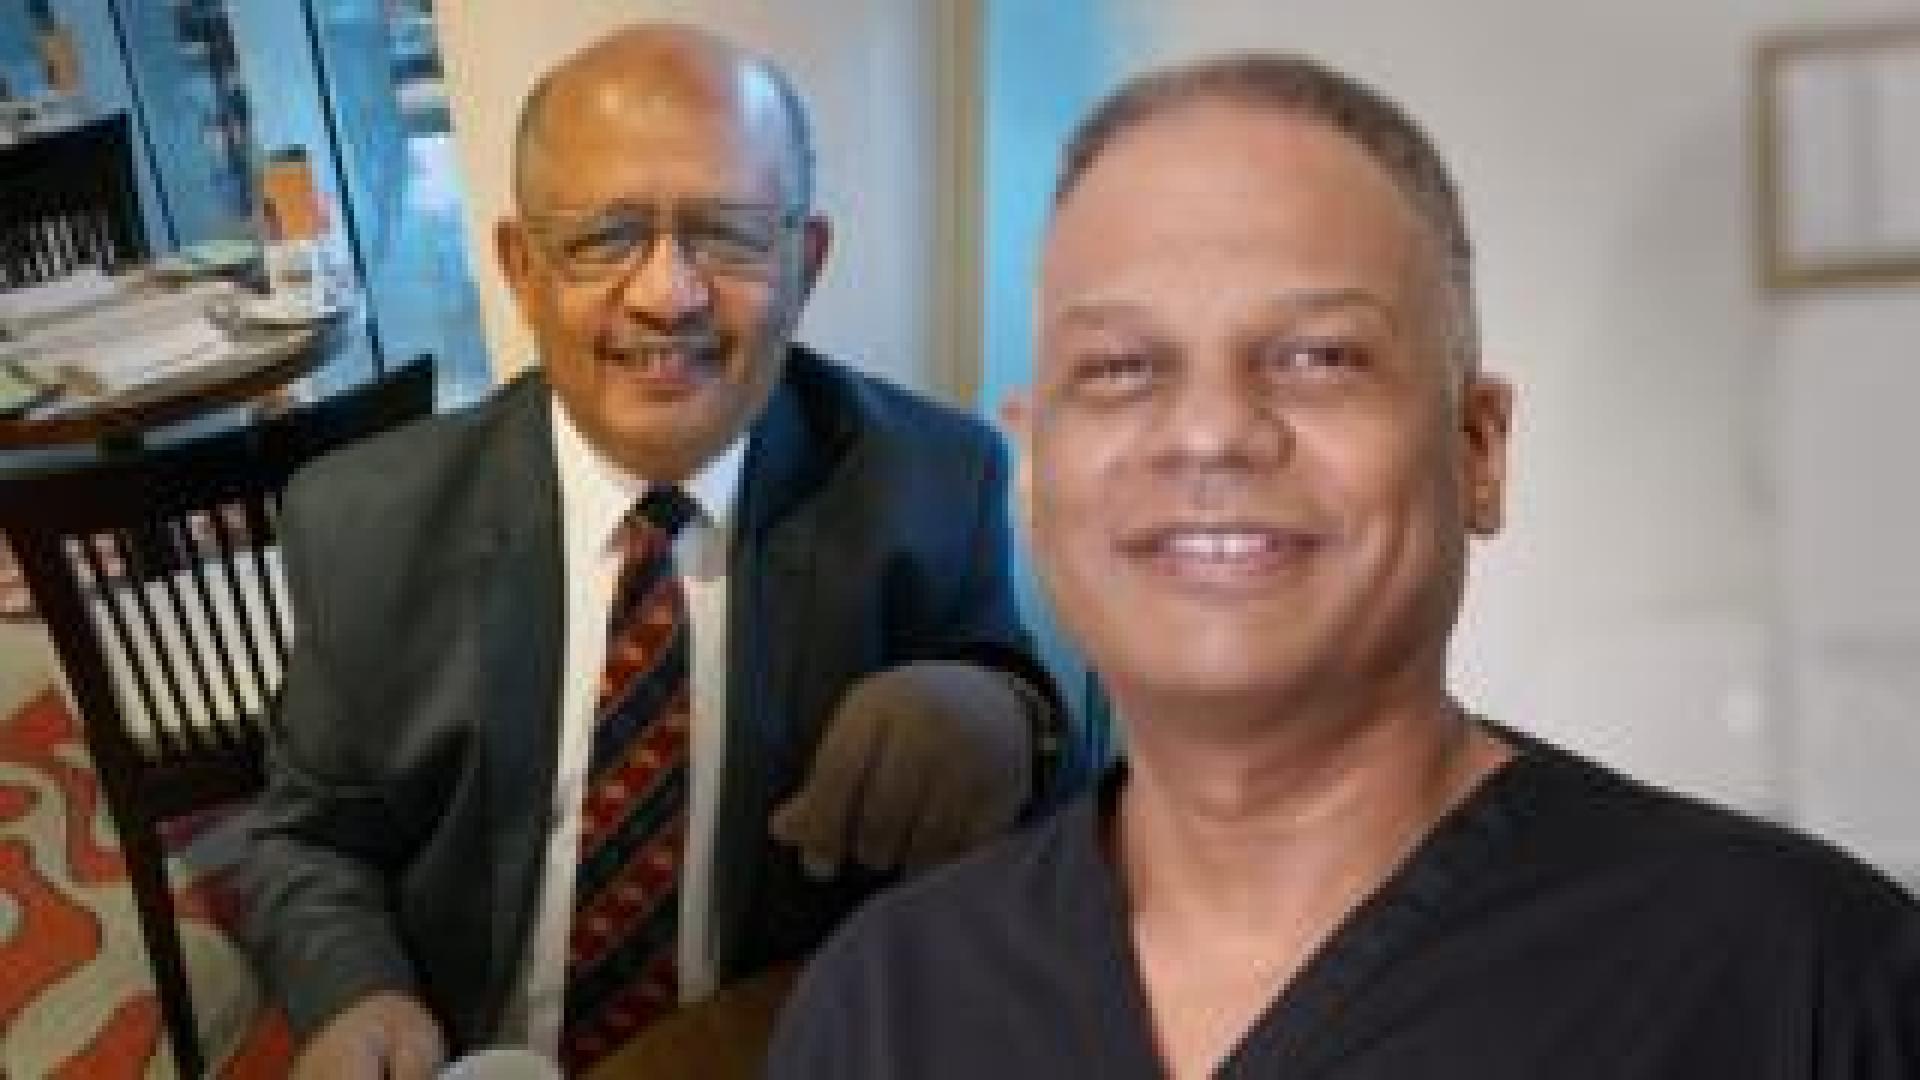 Adil El Tayar (left) and Amged El-Hawrani